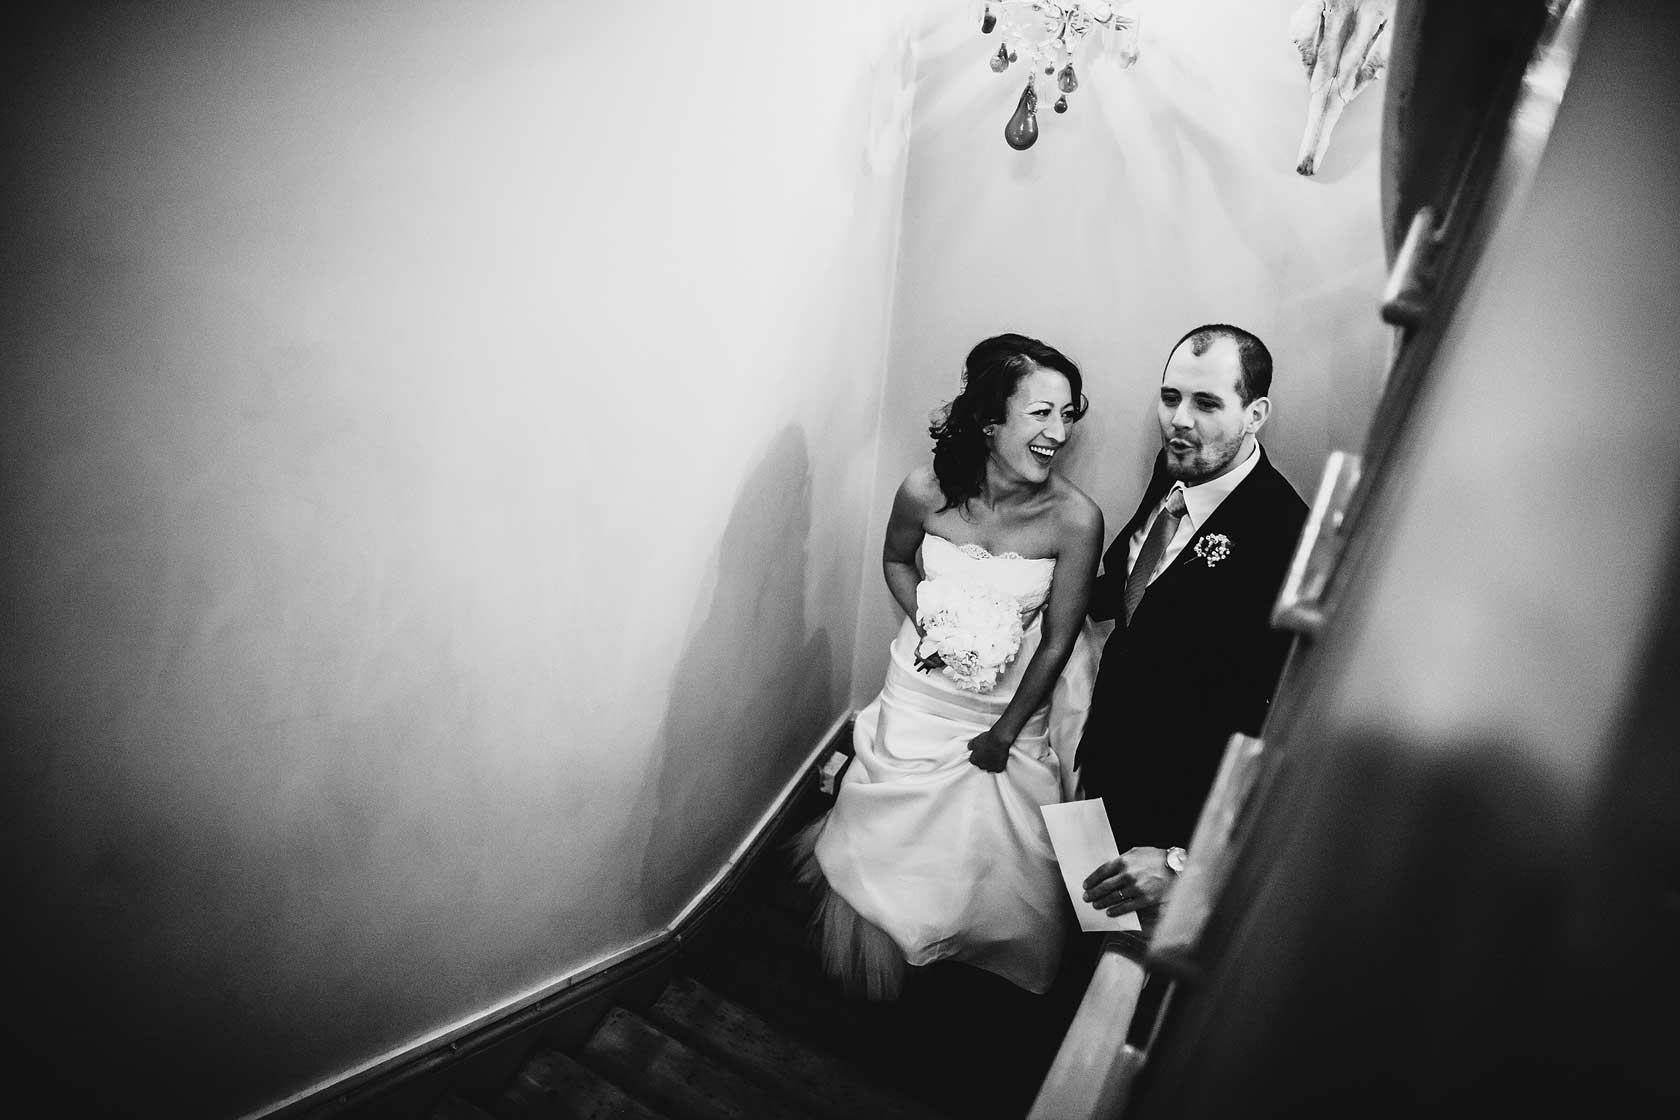 Wedding Photography at Islington Town Hall